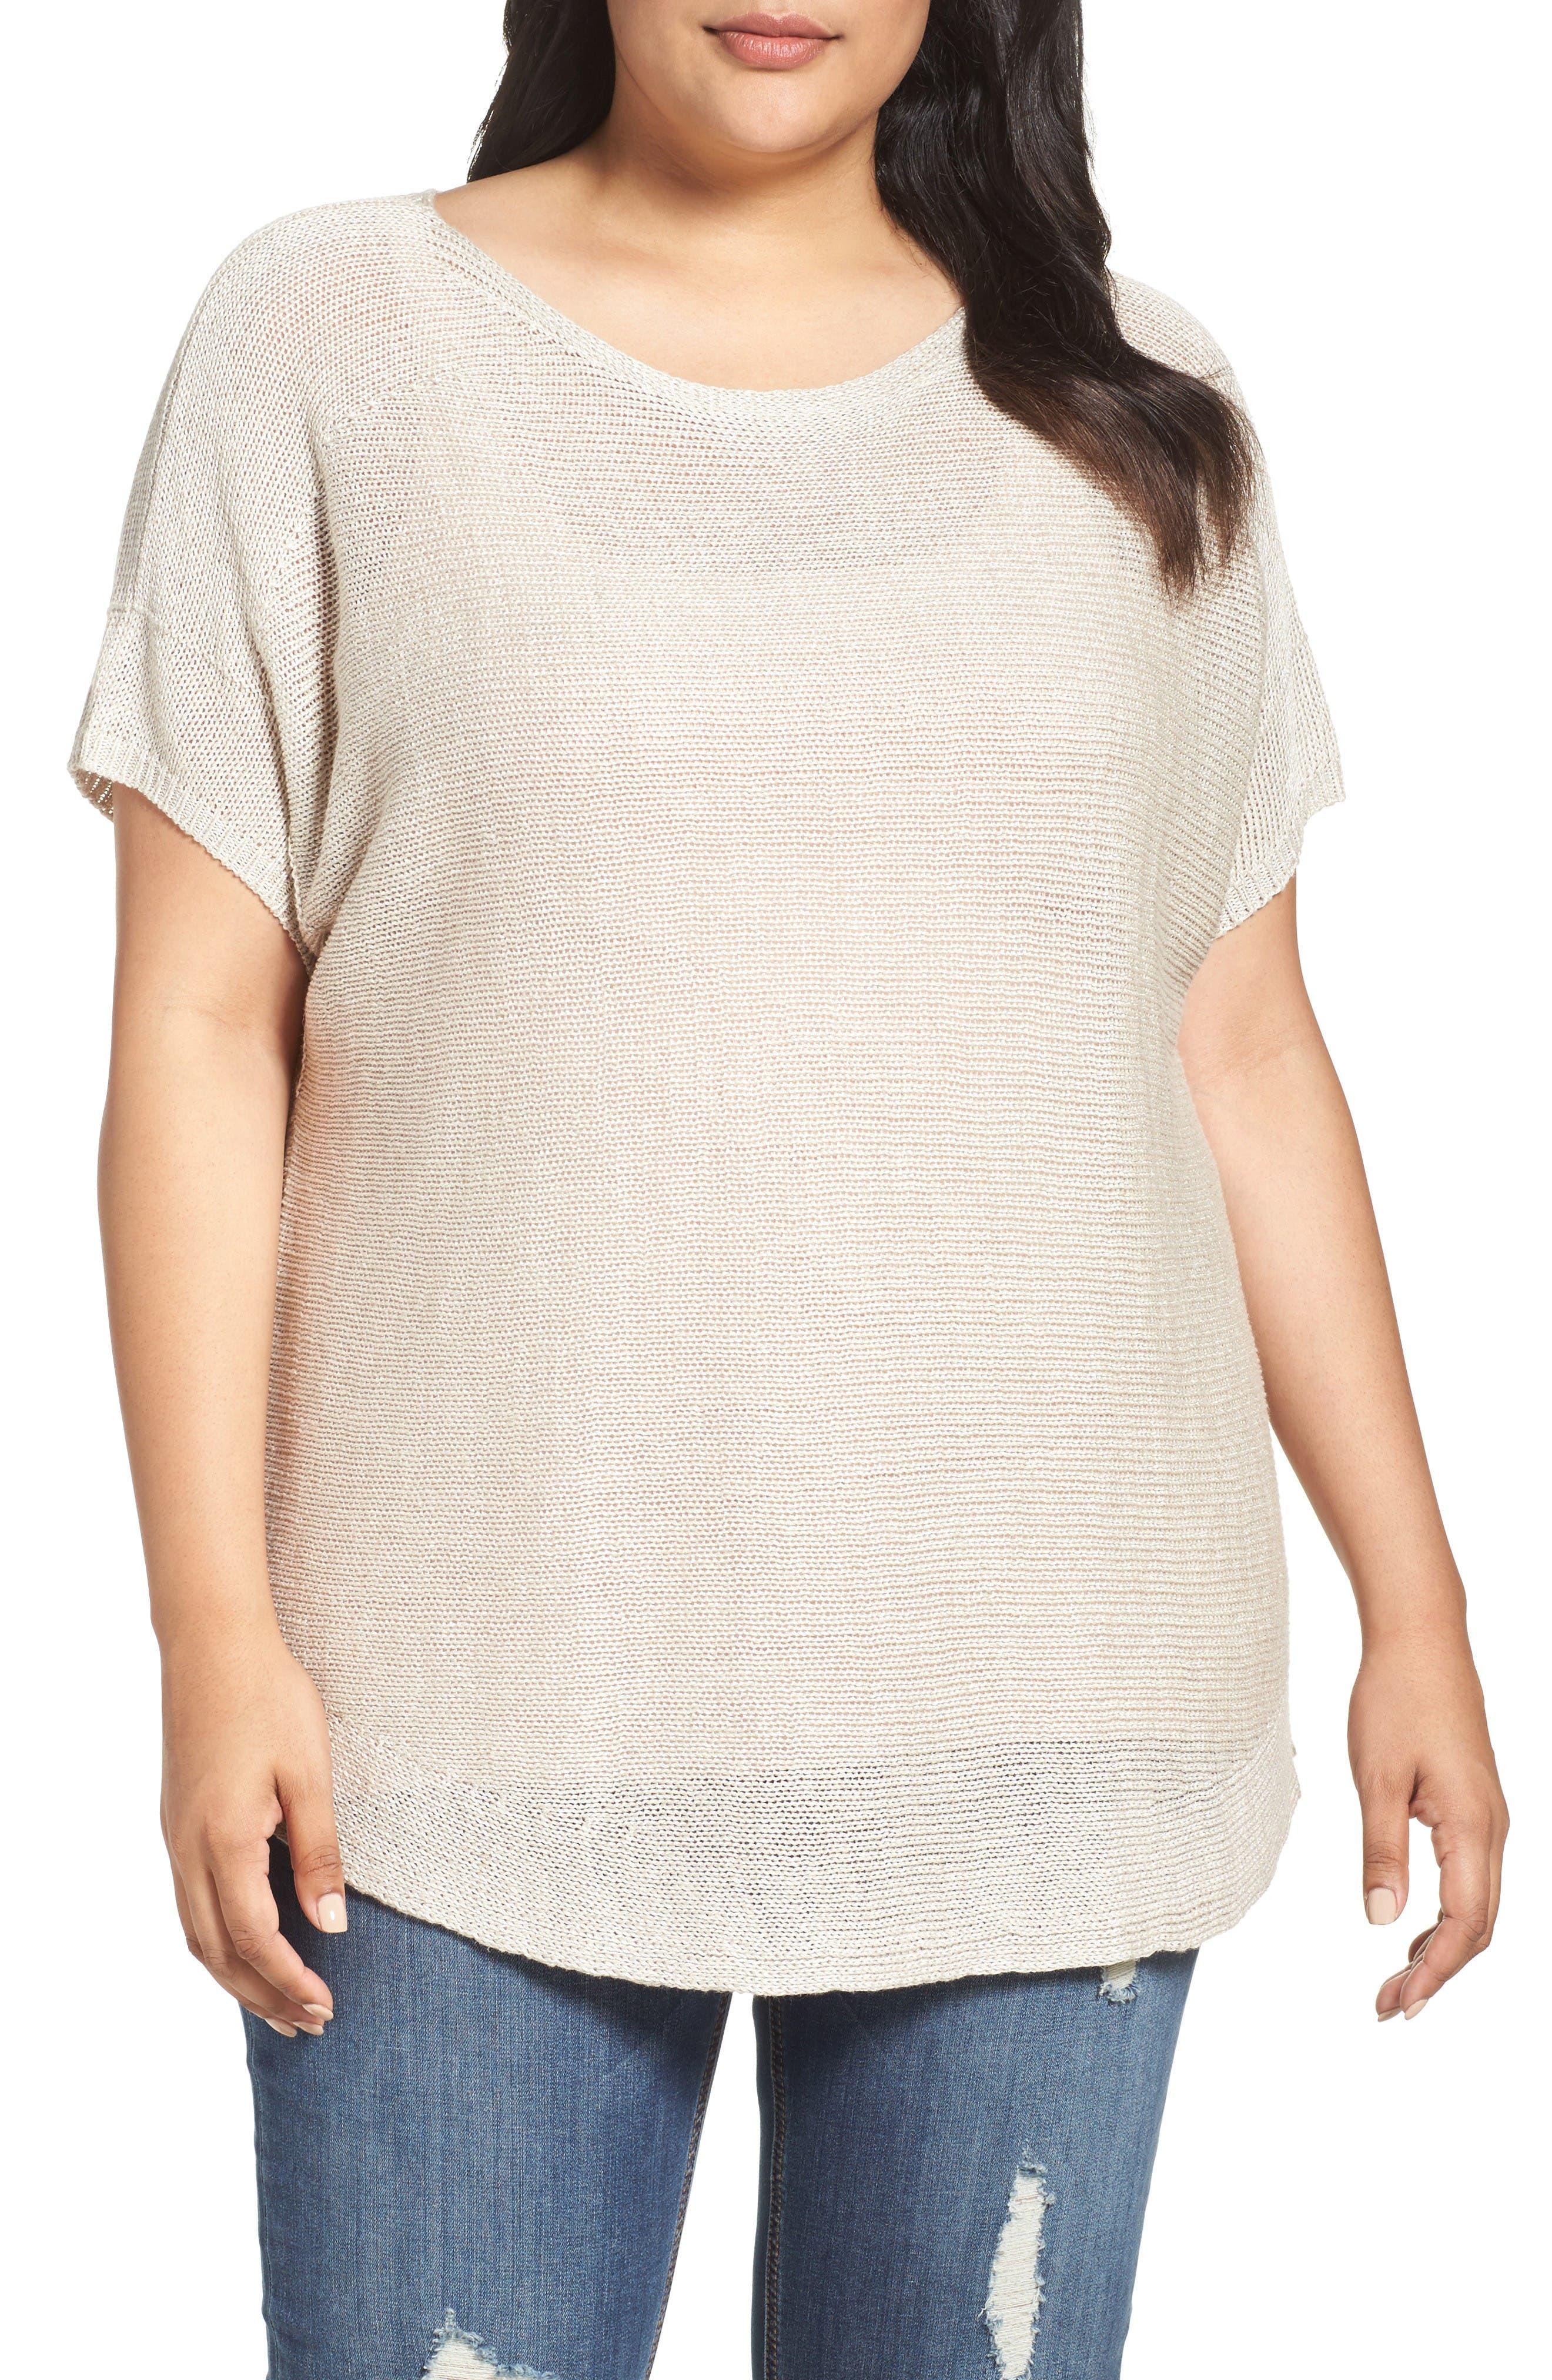 Tart Padma Linen Blend Sweater (Plus Size)